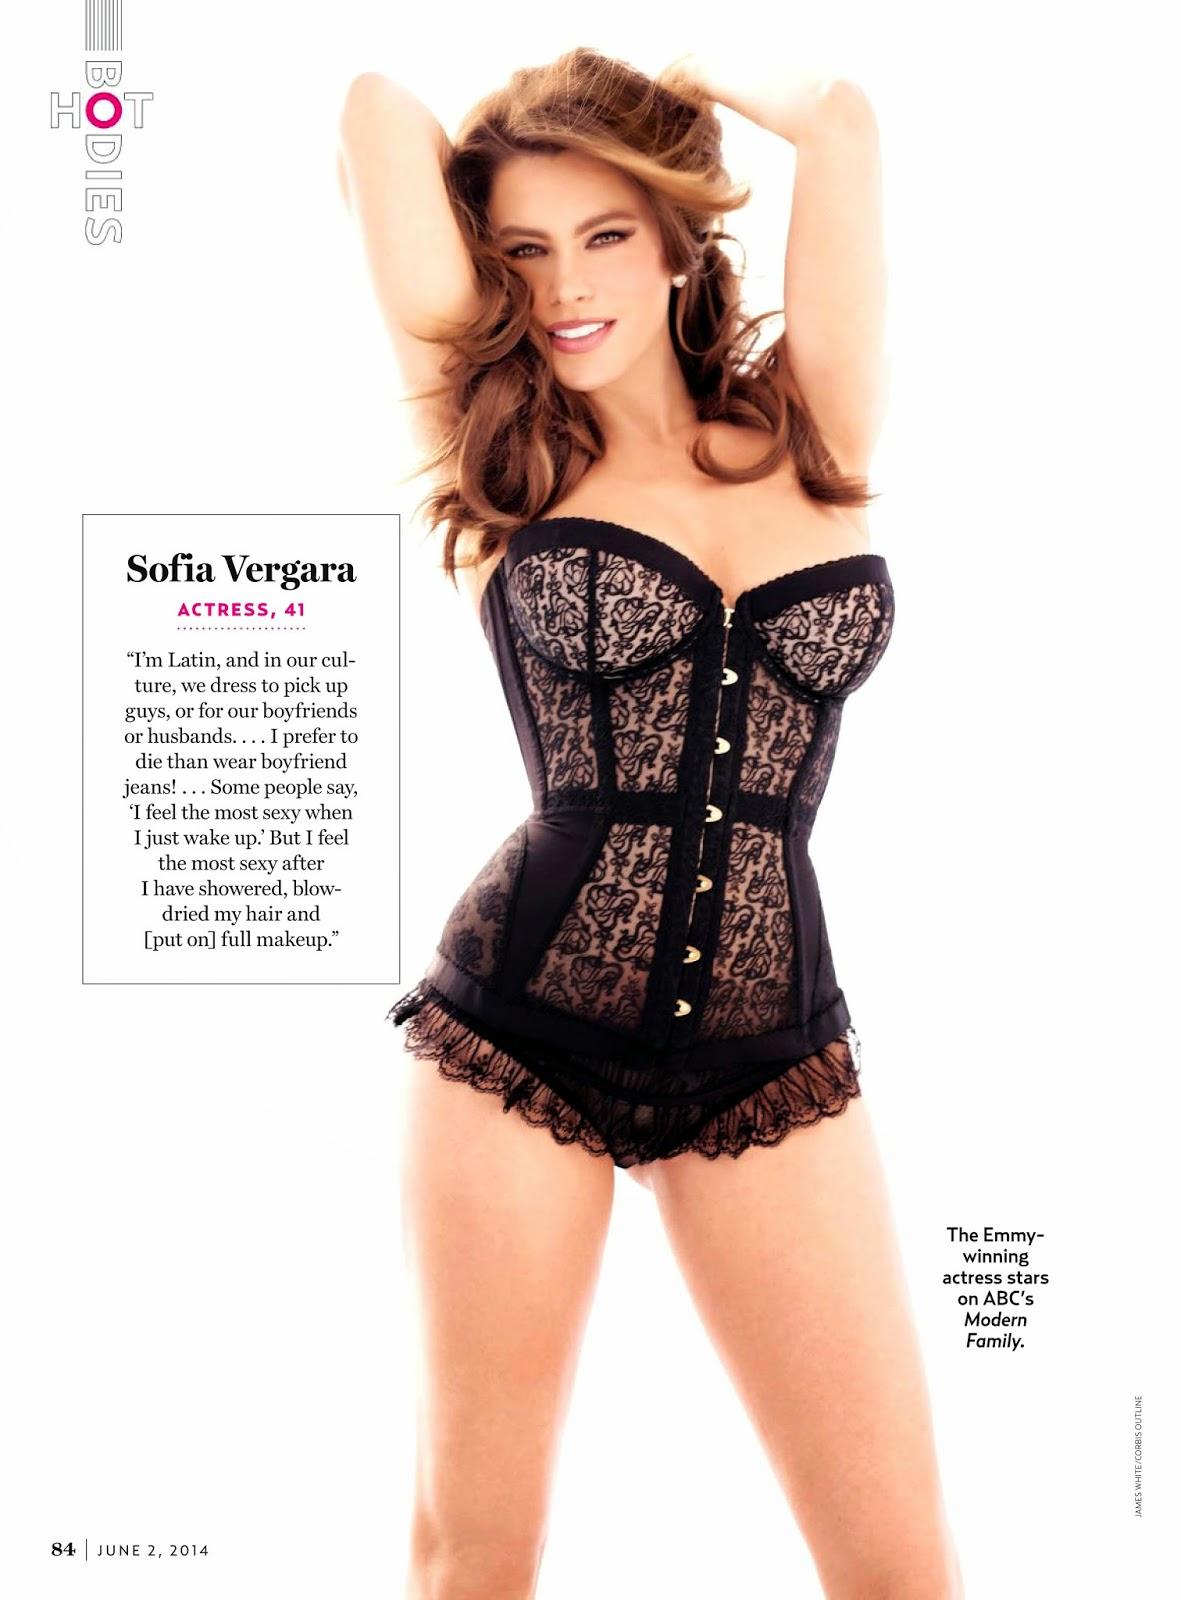 Heidi Klum Charlize Theron Jessica Alba For Us Weekly Magazine